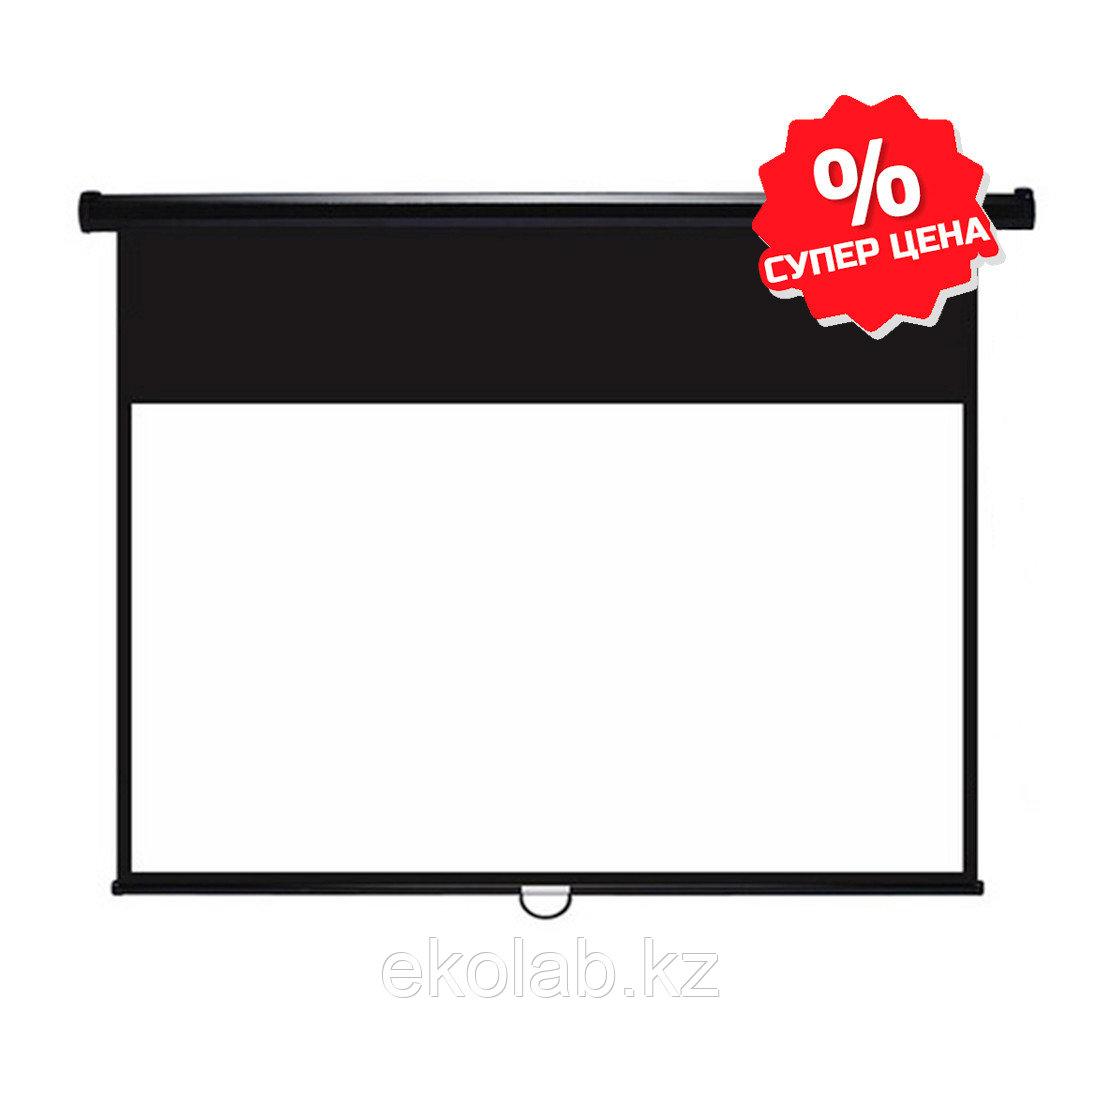 "Экран Deluxe DLS-M229-185 (90""х73""), Ø - 116"", Раб. поверхность 221х125 см., 16:9"